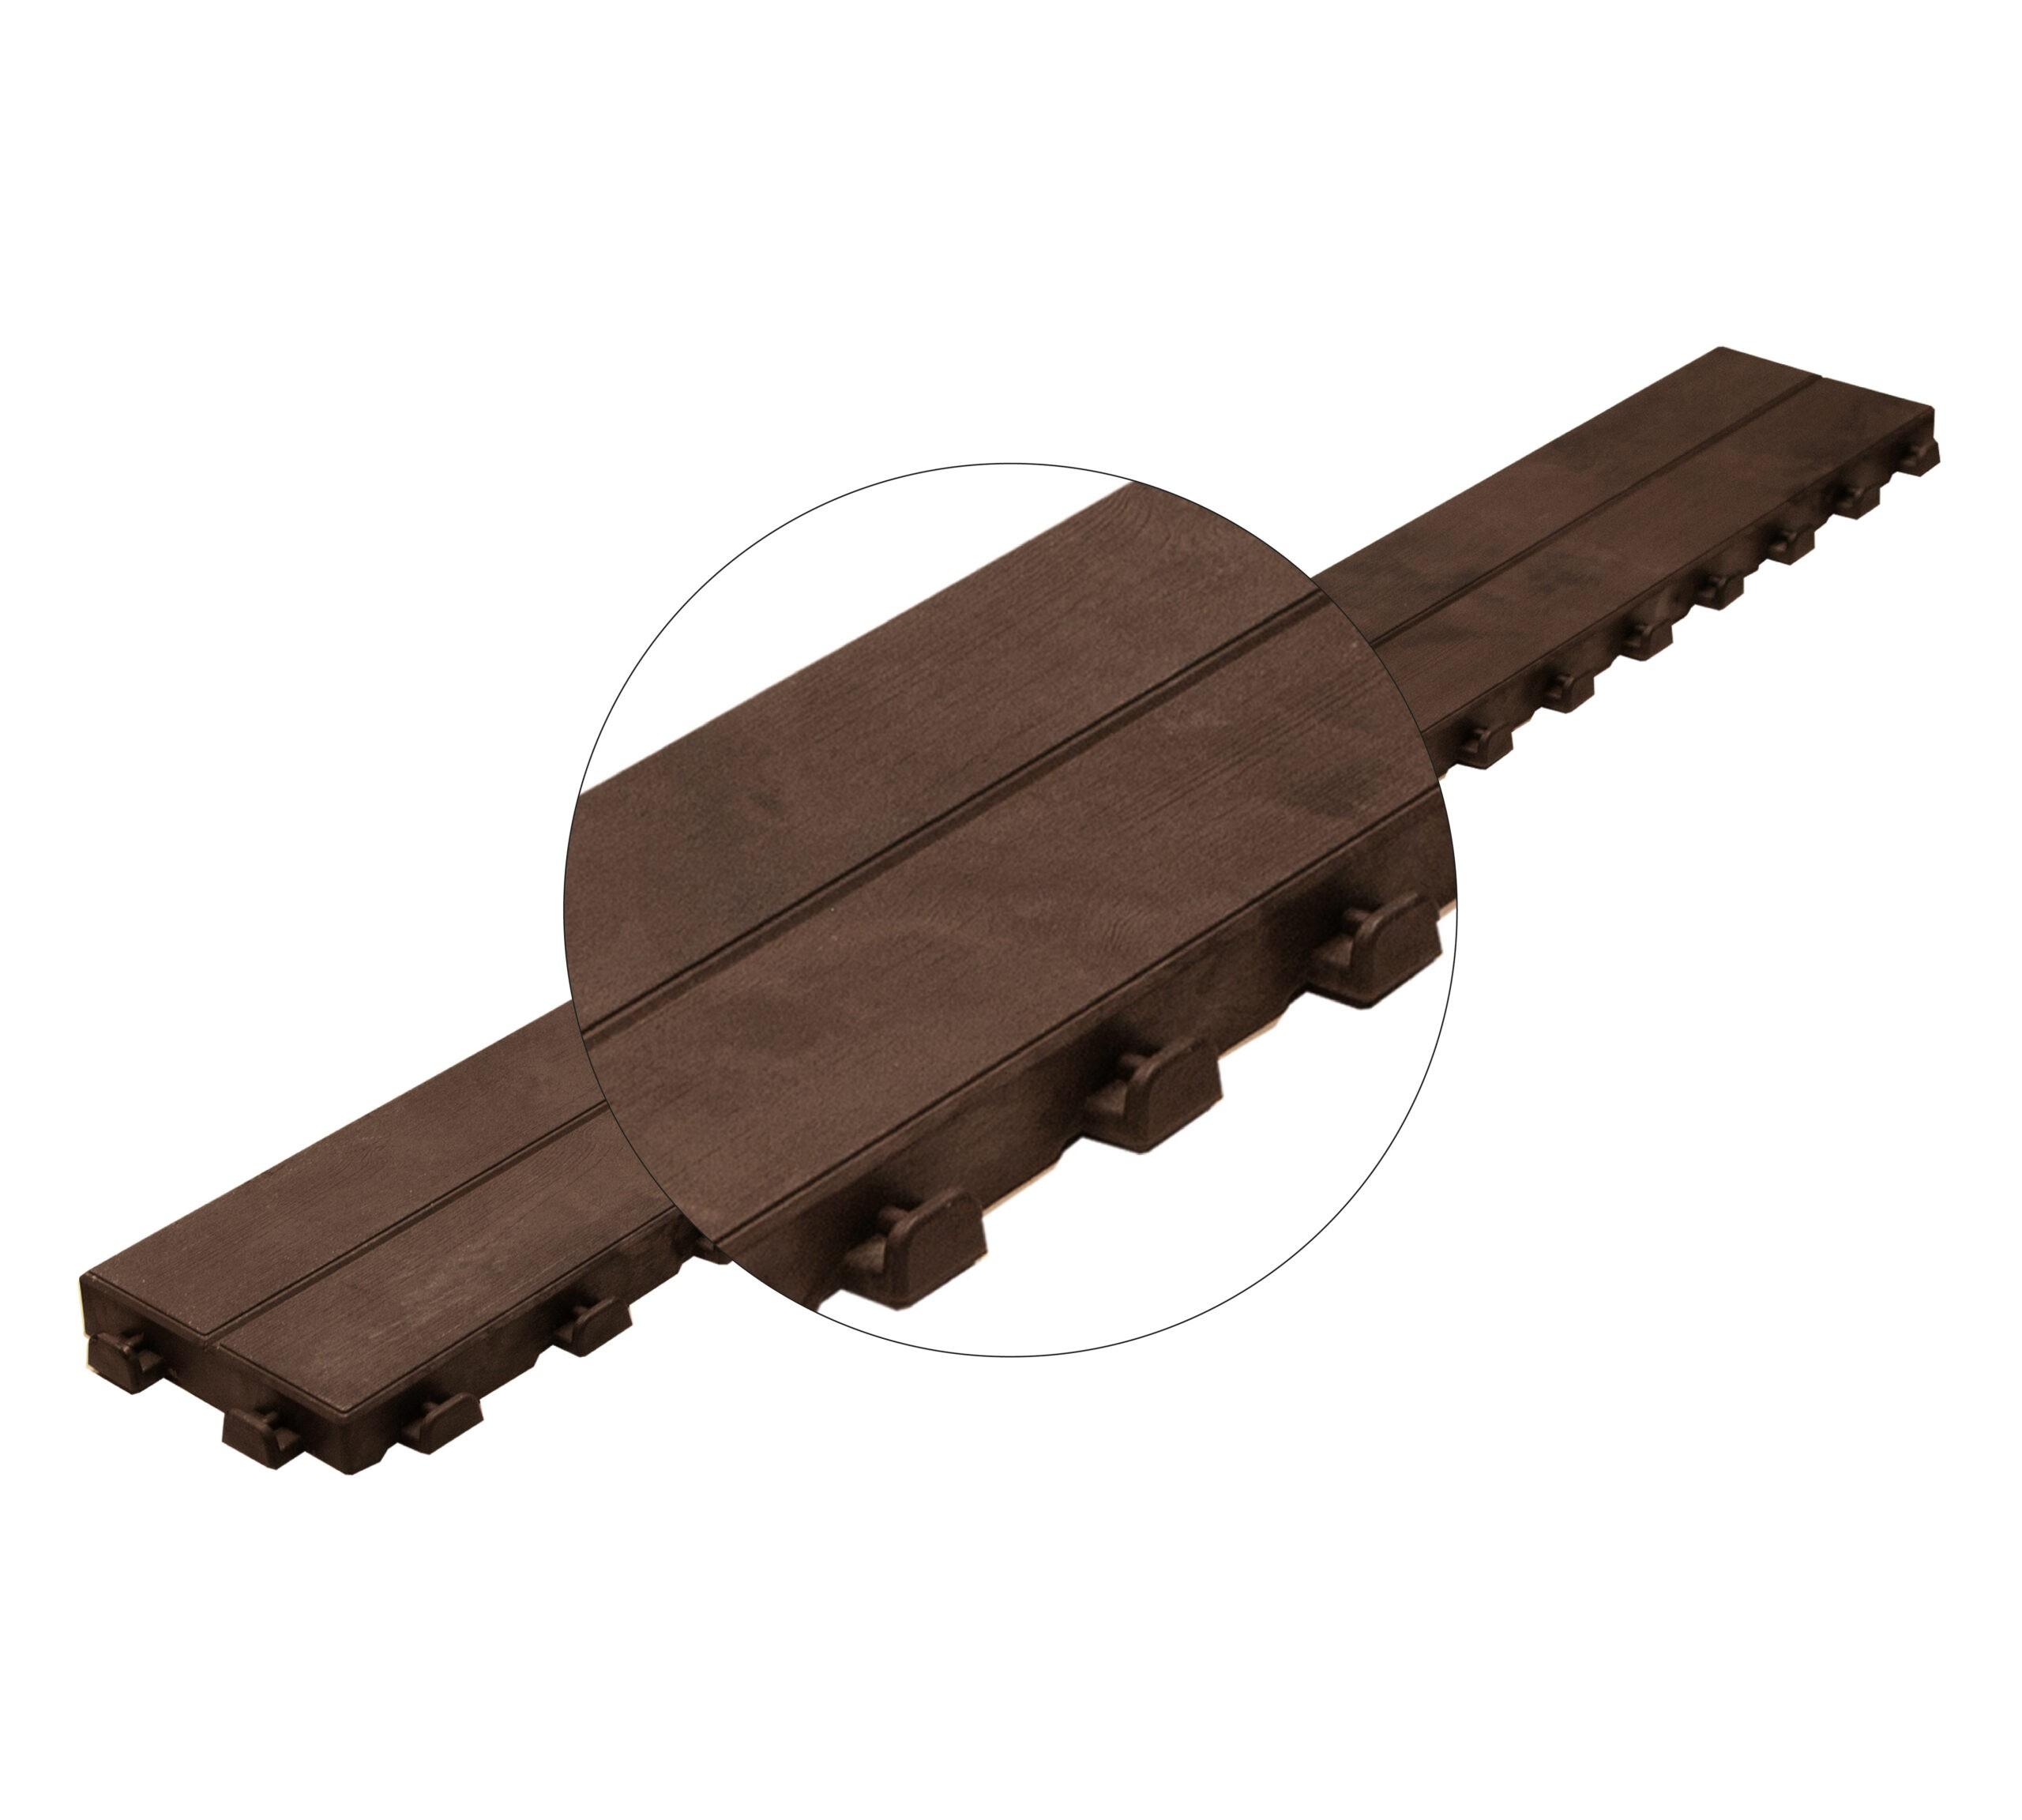 Dettaglio aggancio listello Linea Woodenlike Art Plast